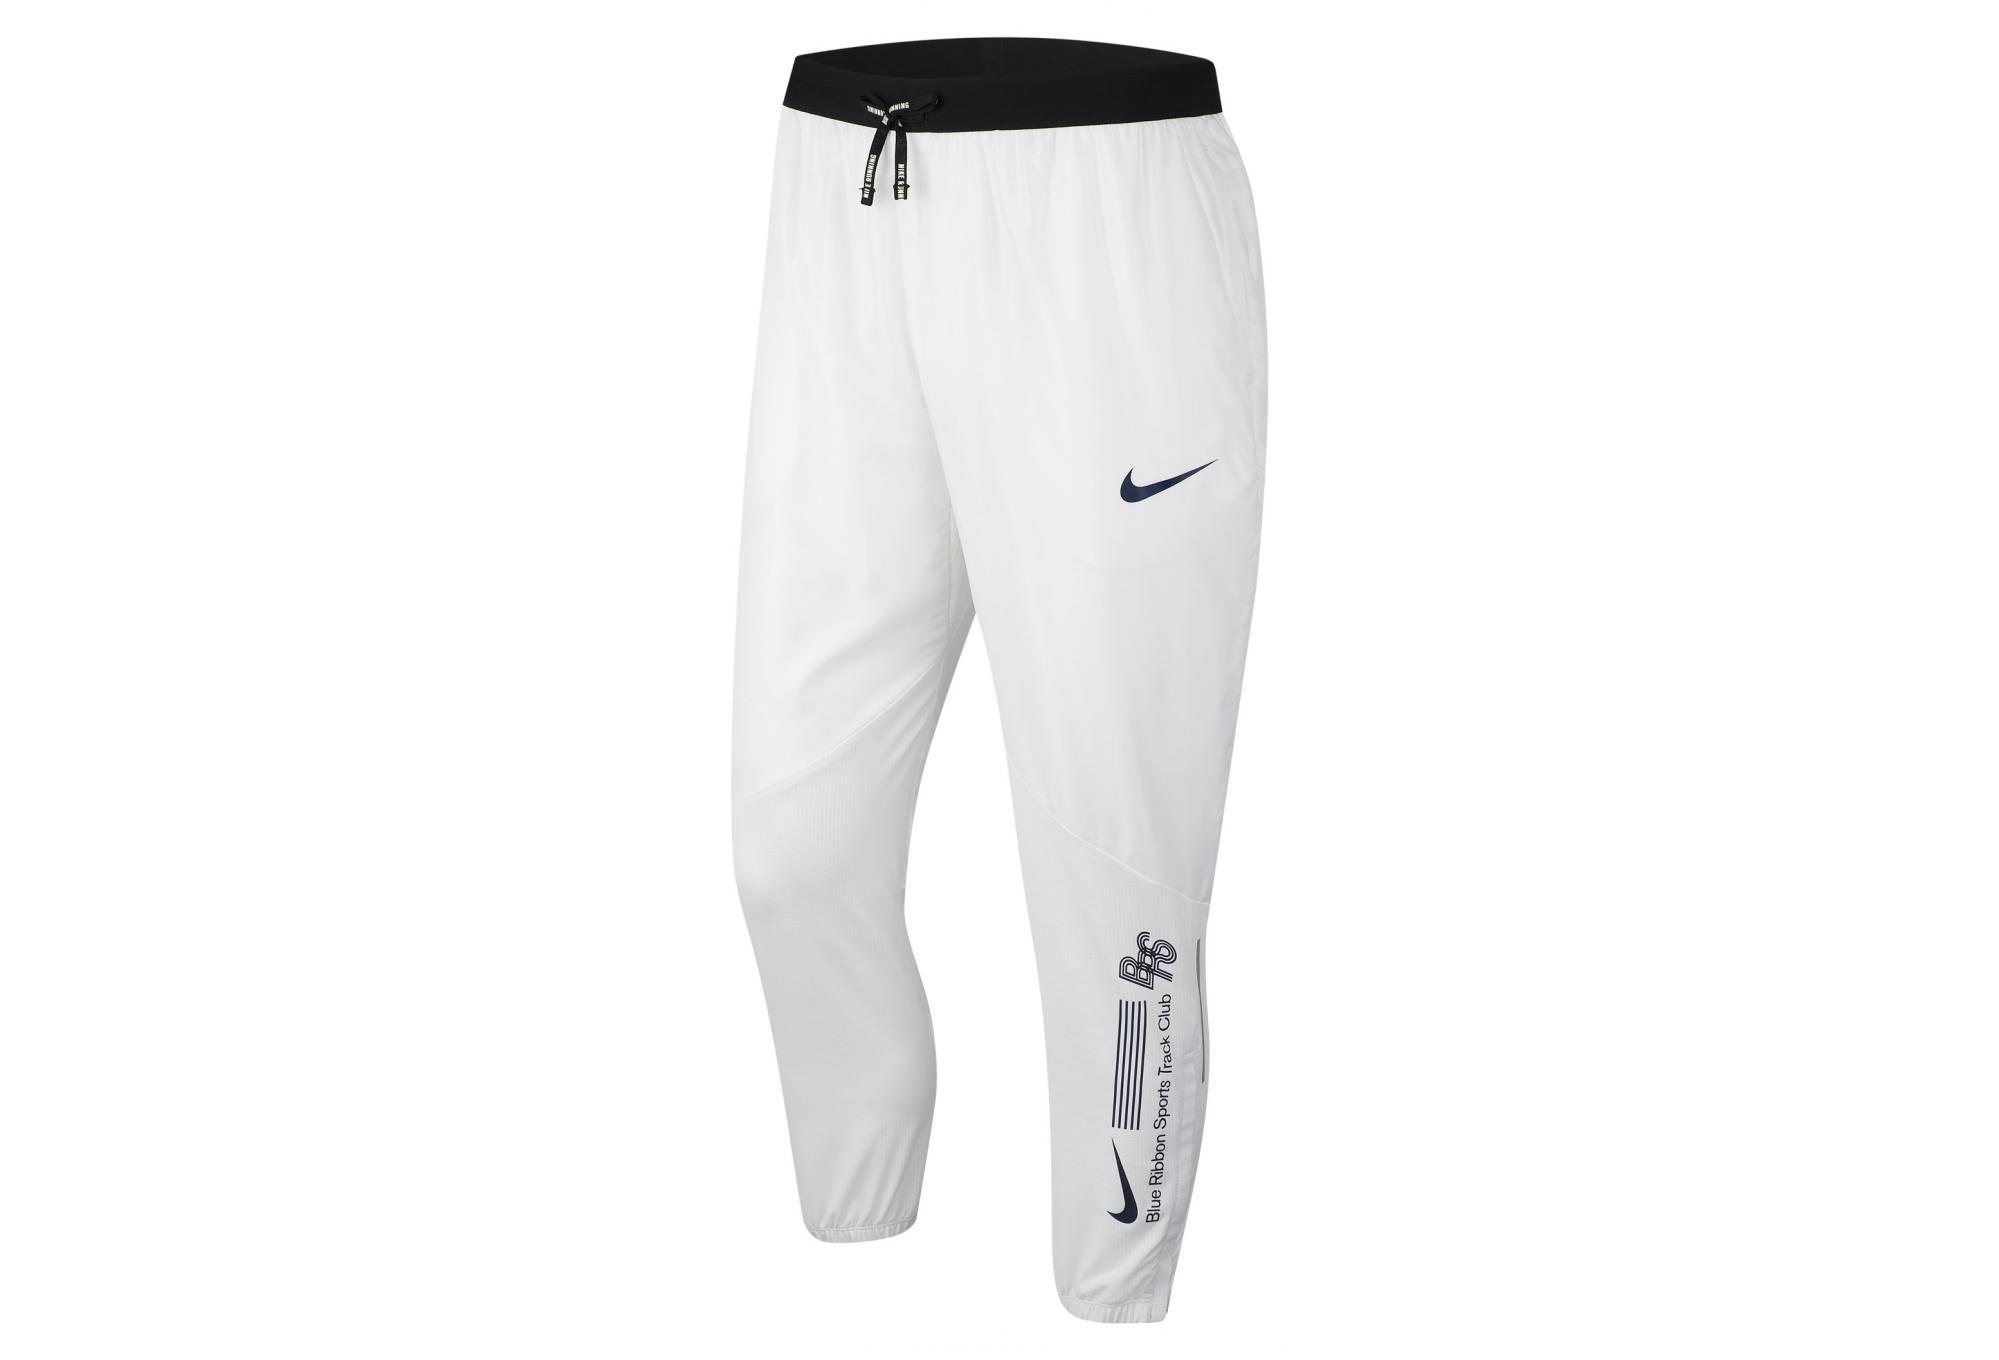 Nike Pant Homme Blanc Pantalon Bleu Brs Track nX0w8OPk